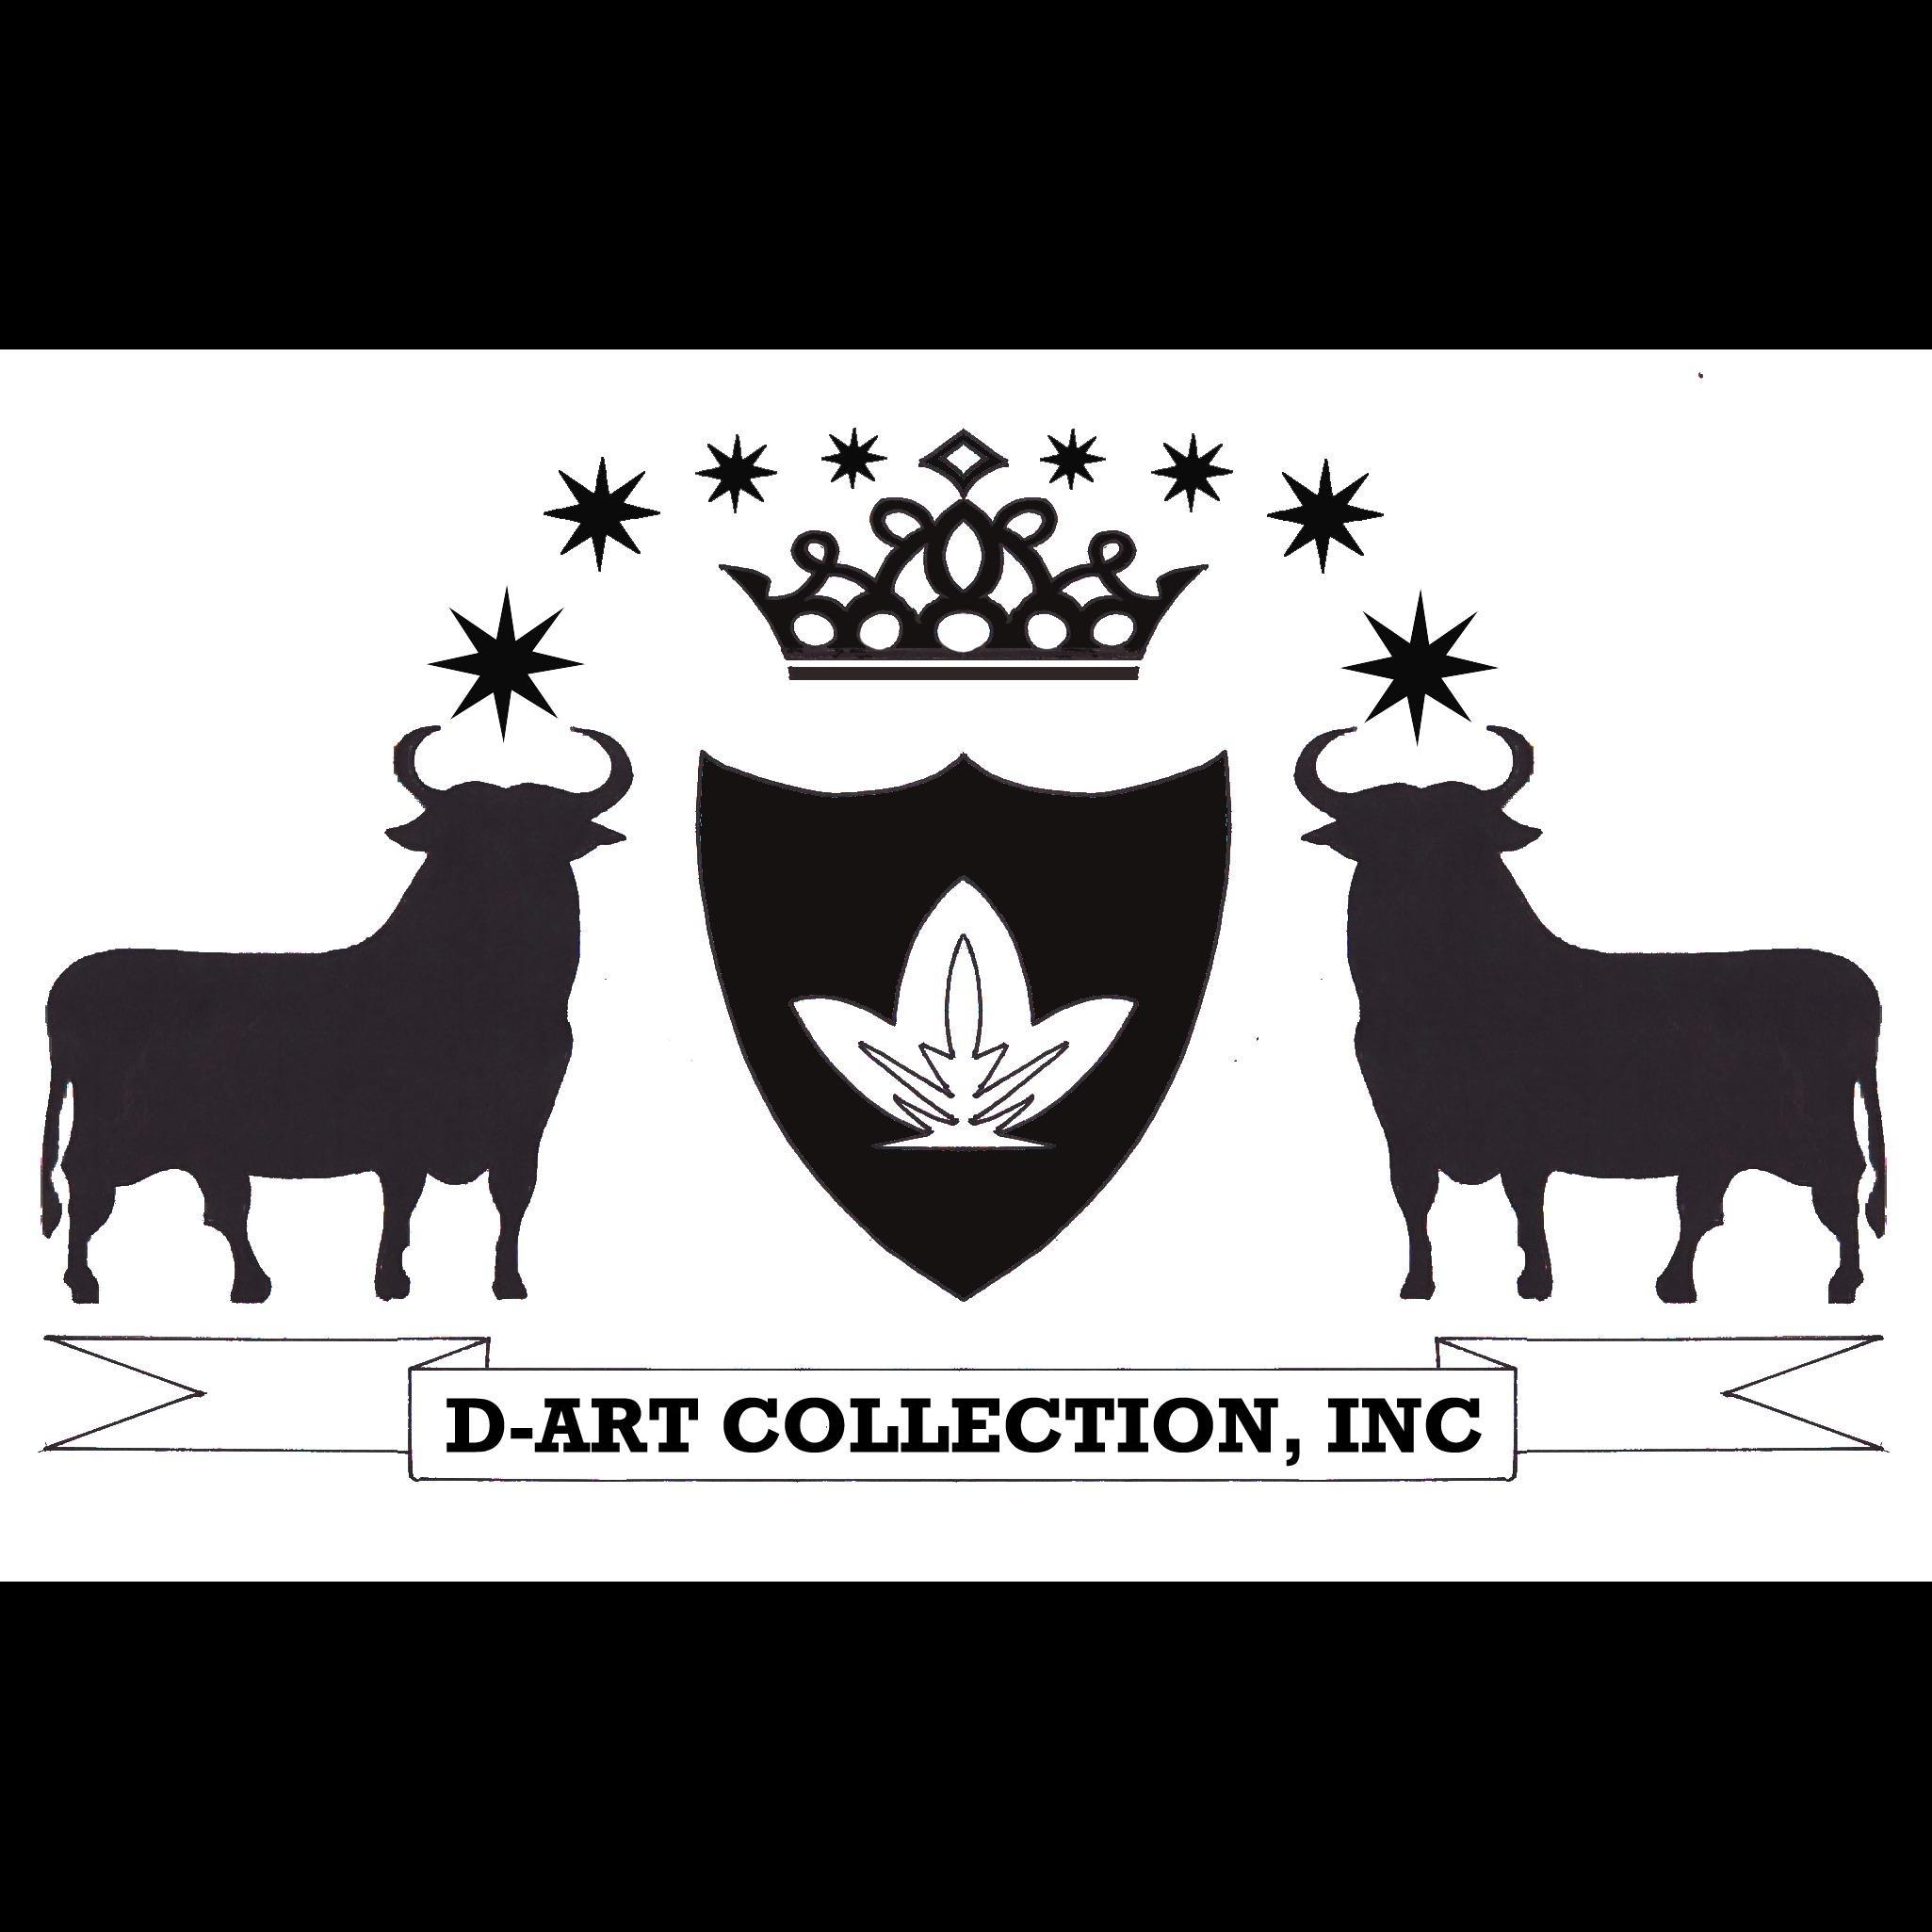 D-Art Collection, Inc